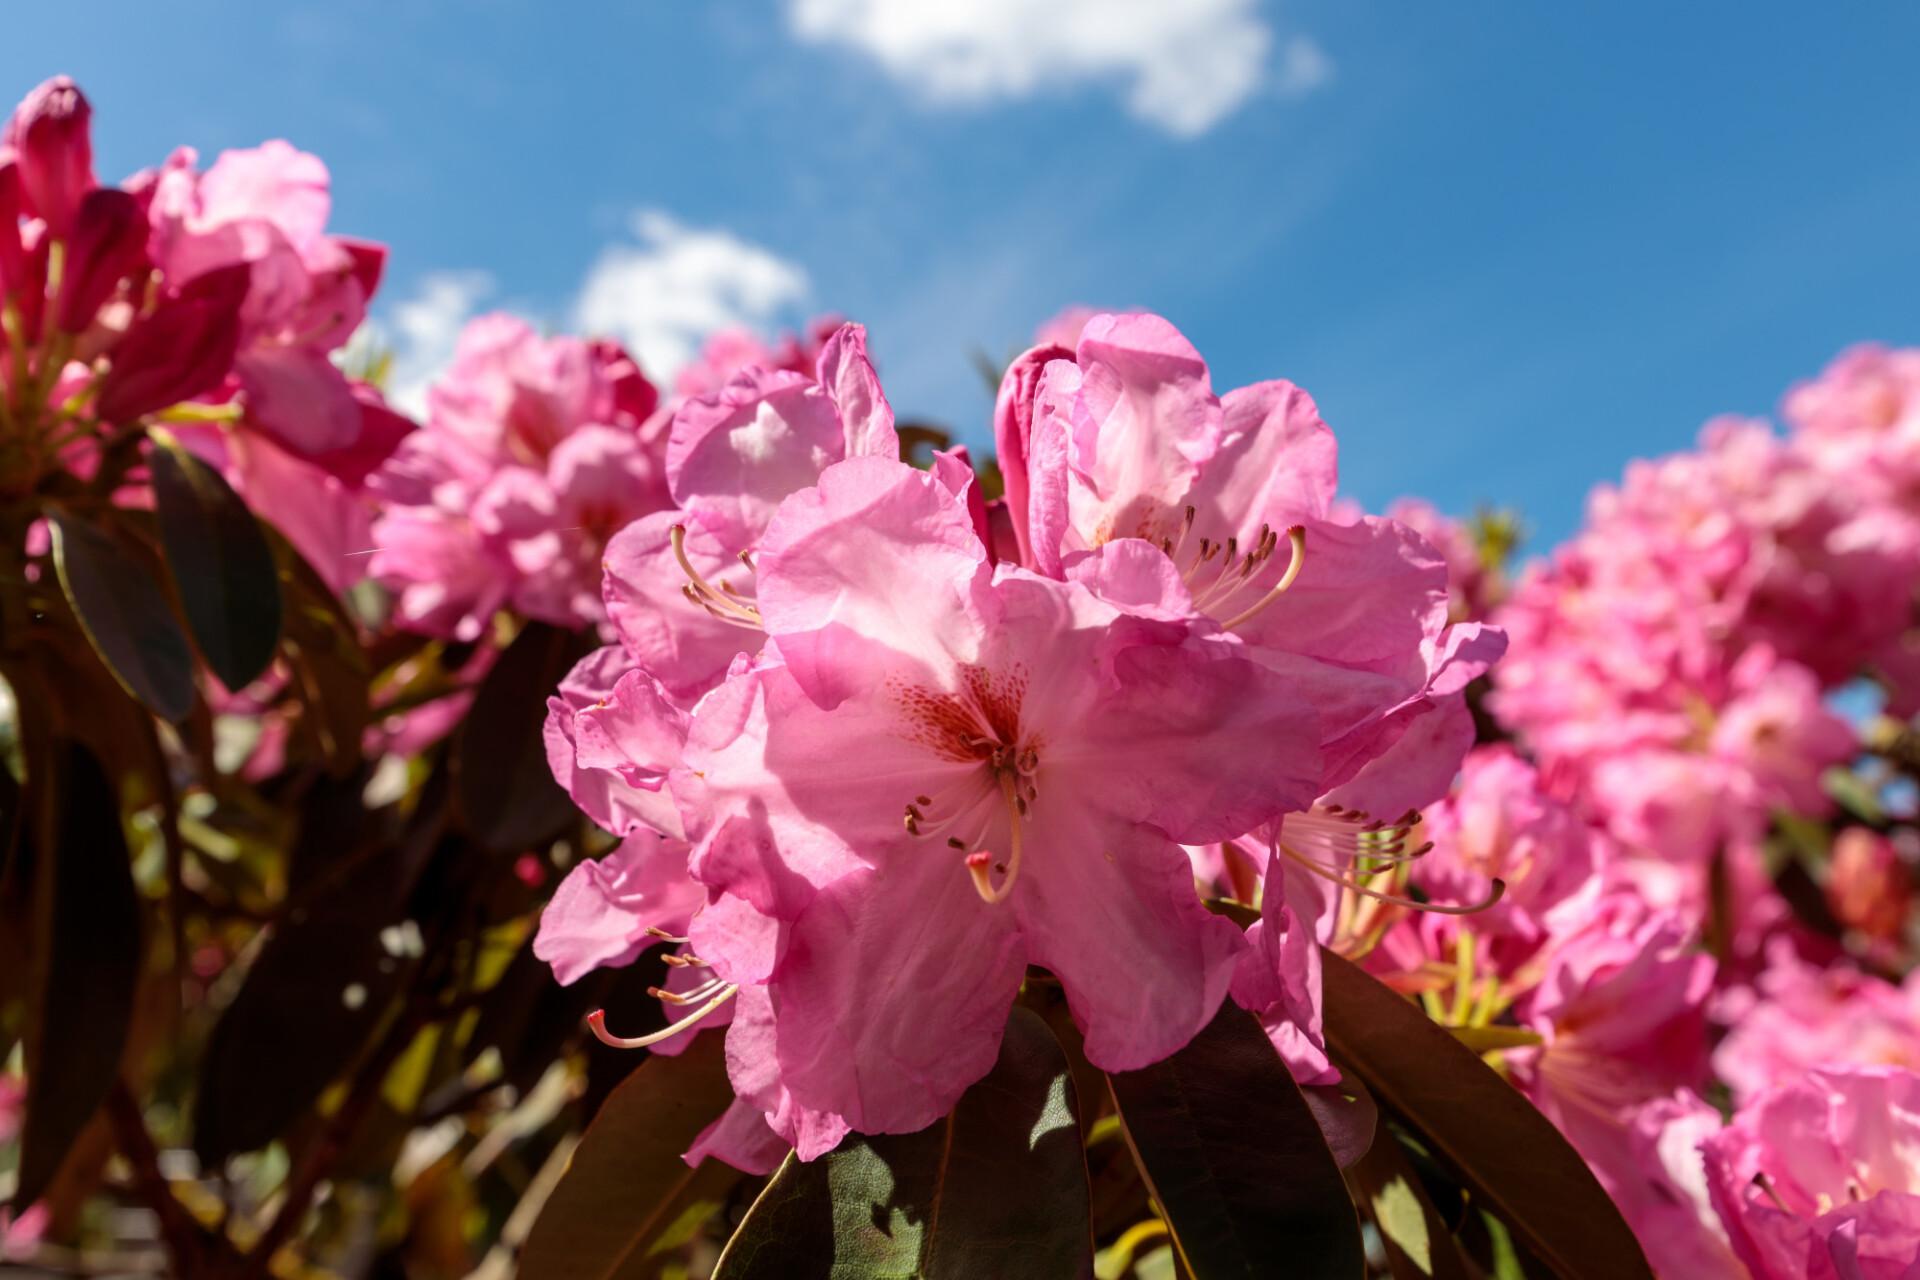 Pink rhododendron bush in the garden